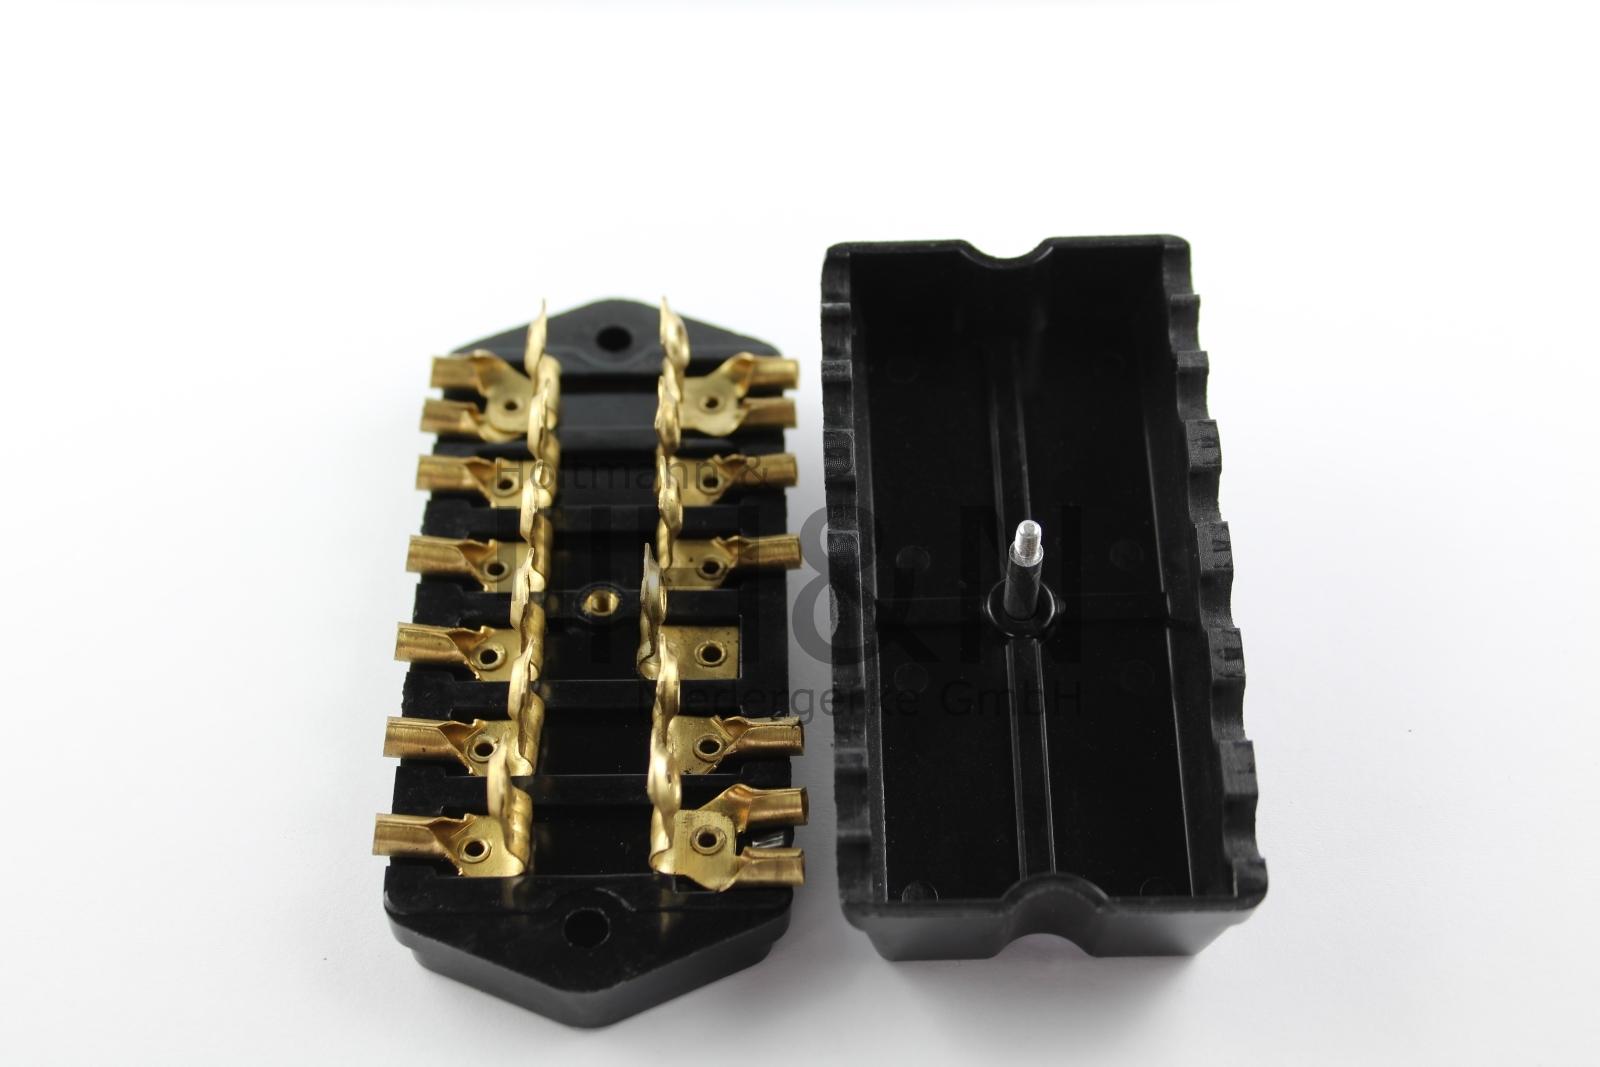 Fuse Box 500d F 1series 600d Multipla 90mm 6 Fuses